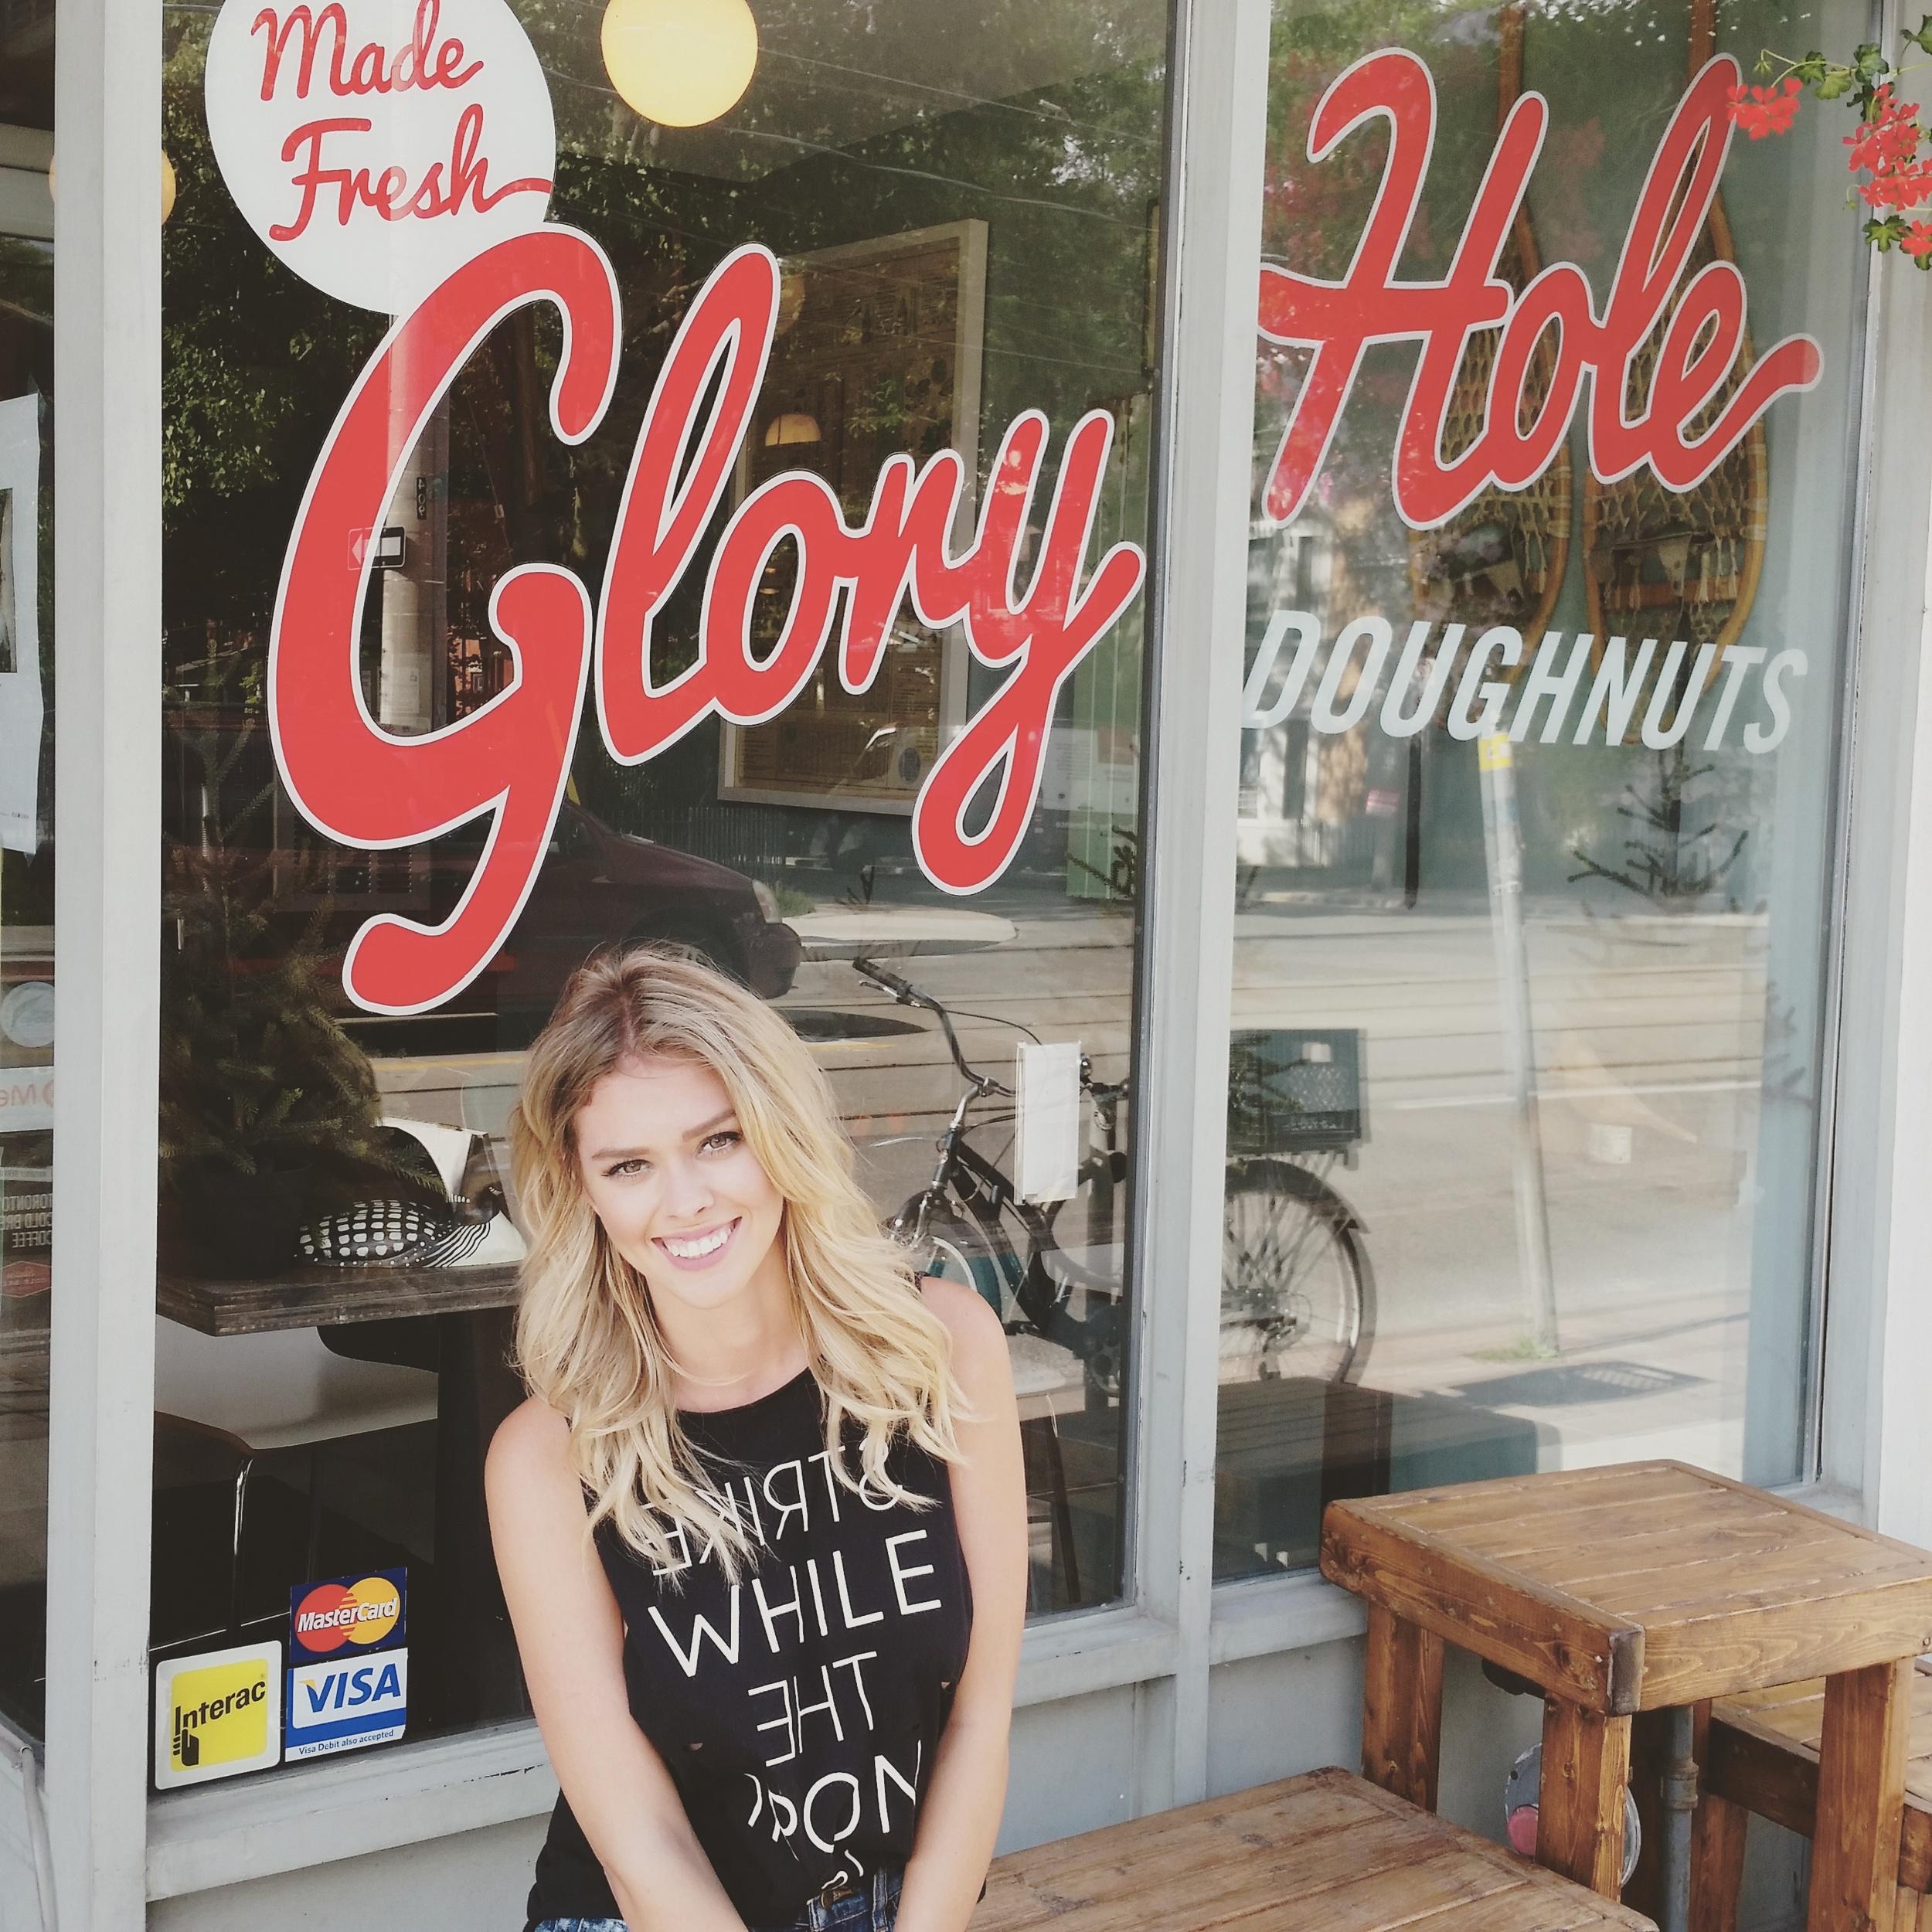 Glory Hole Doughnuts Laura Christine Clark Studio V